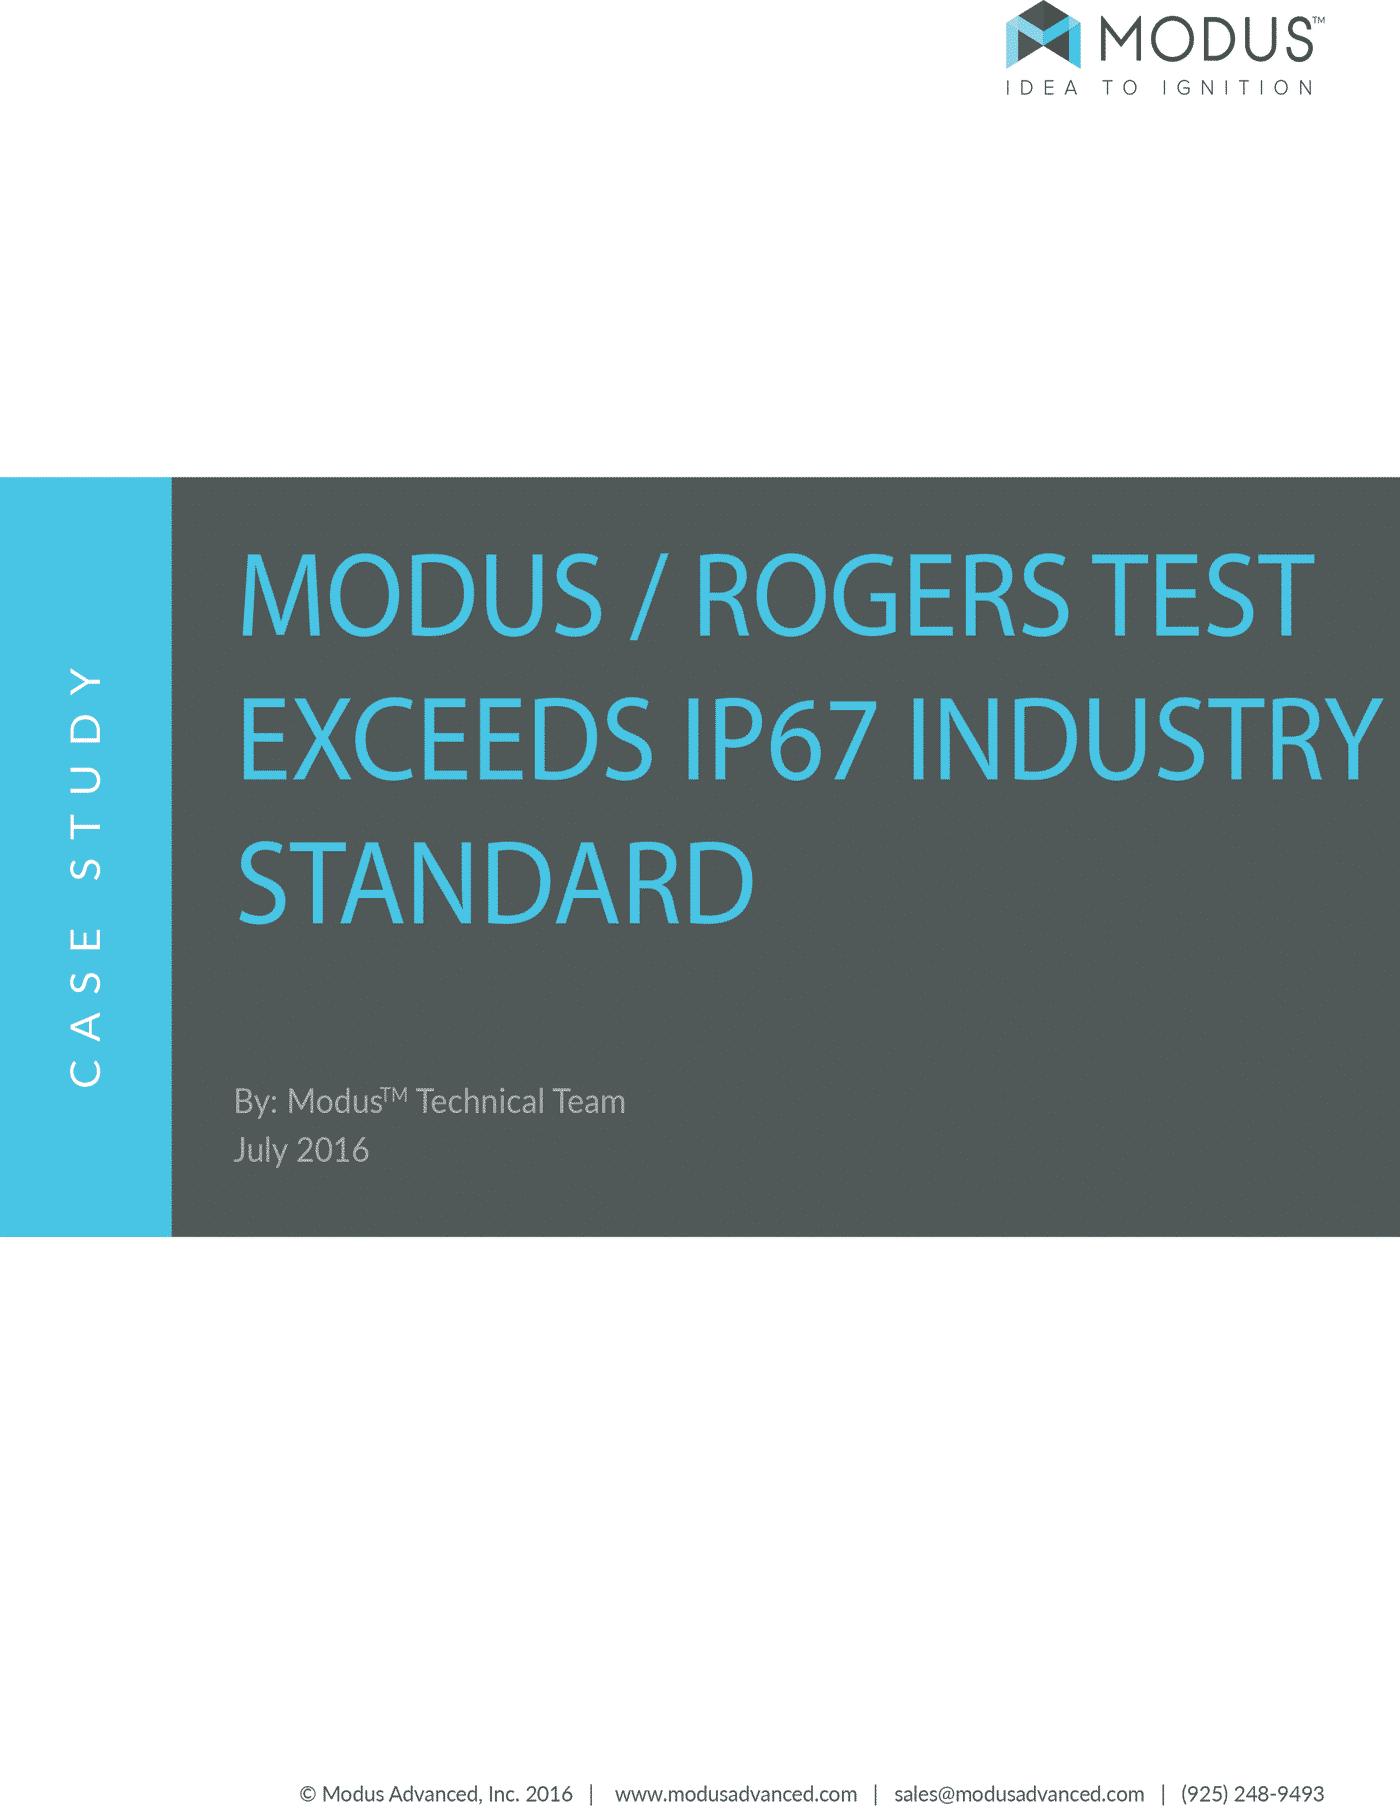 rogers-test-exceeds-ip67-industry-standard